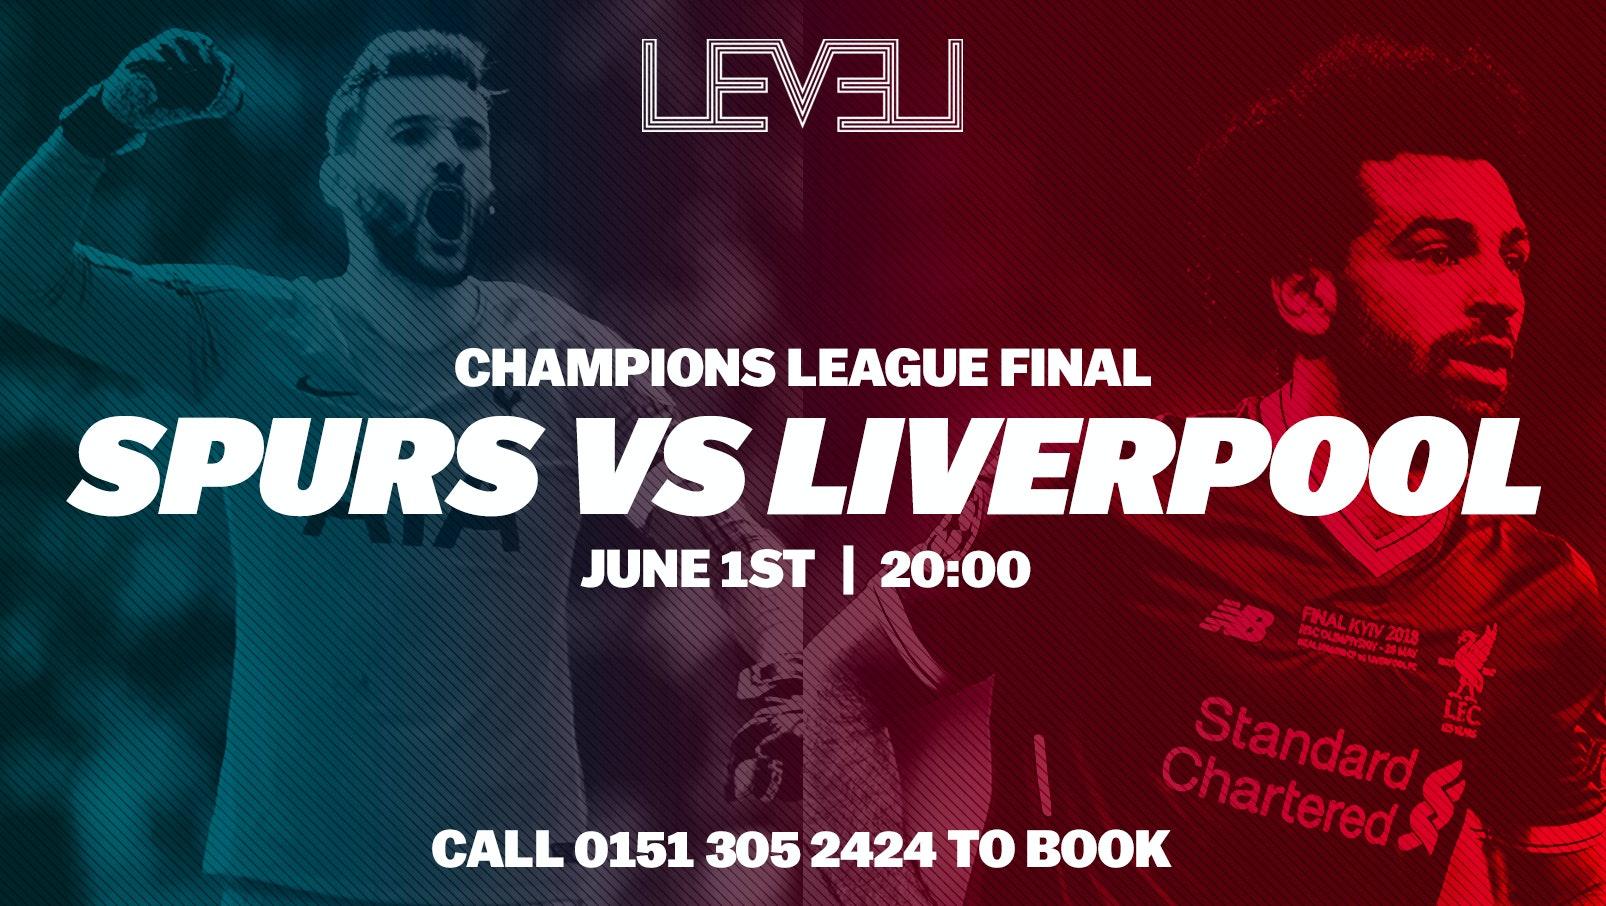 Champions League Final LIVE at Level